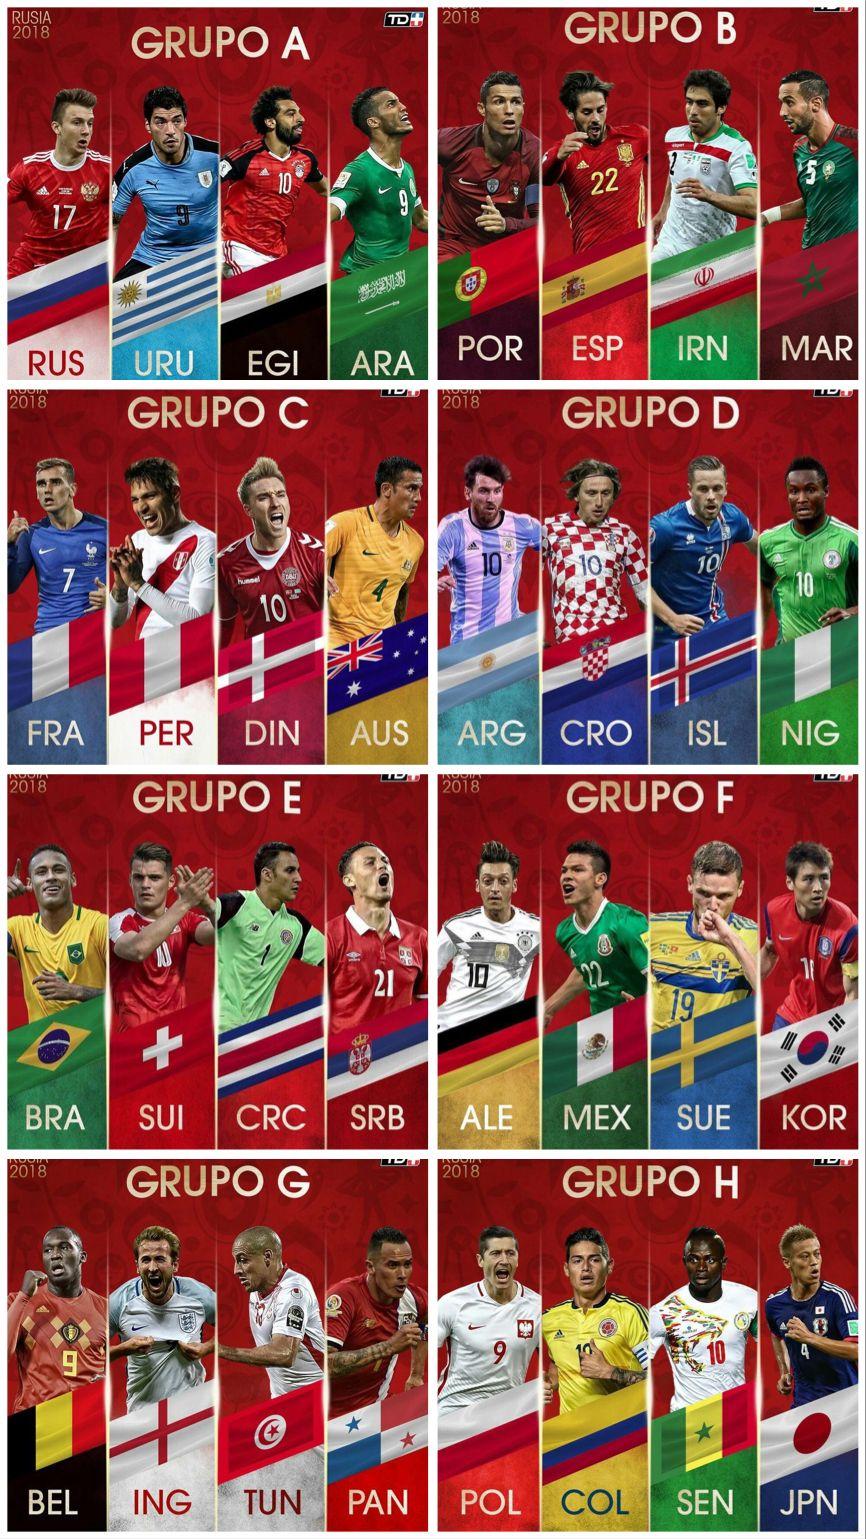 Rusia 2018 Grupos Copa Del Mundo De Futbol Rusia 2018 Copa Del Mundo